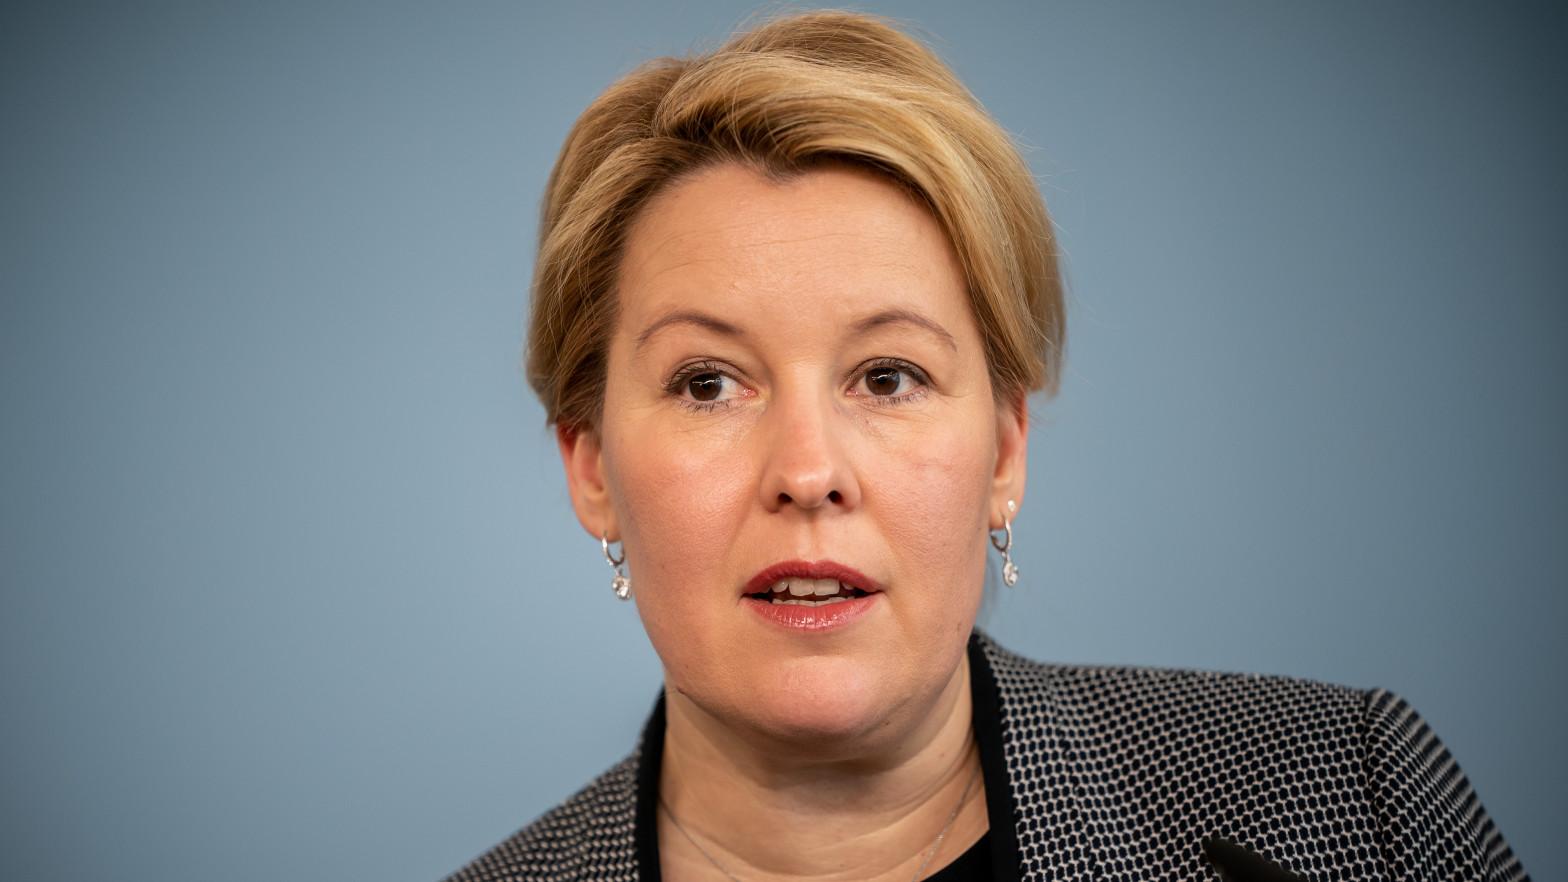 La ministra alemana de Familia dimite por presunto plagio en su tesis doctoral